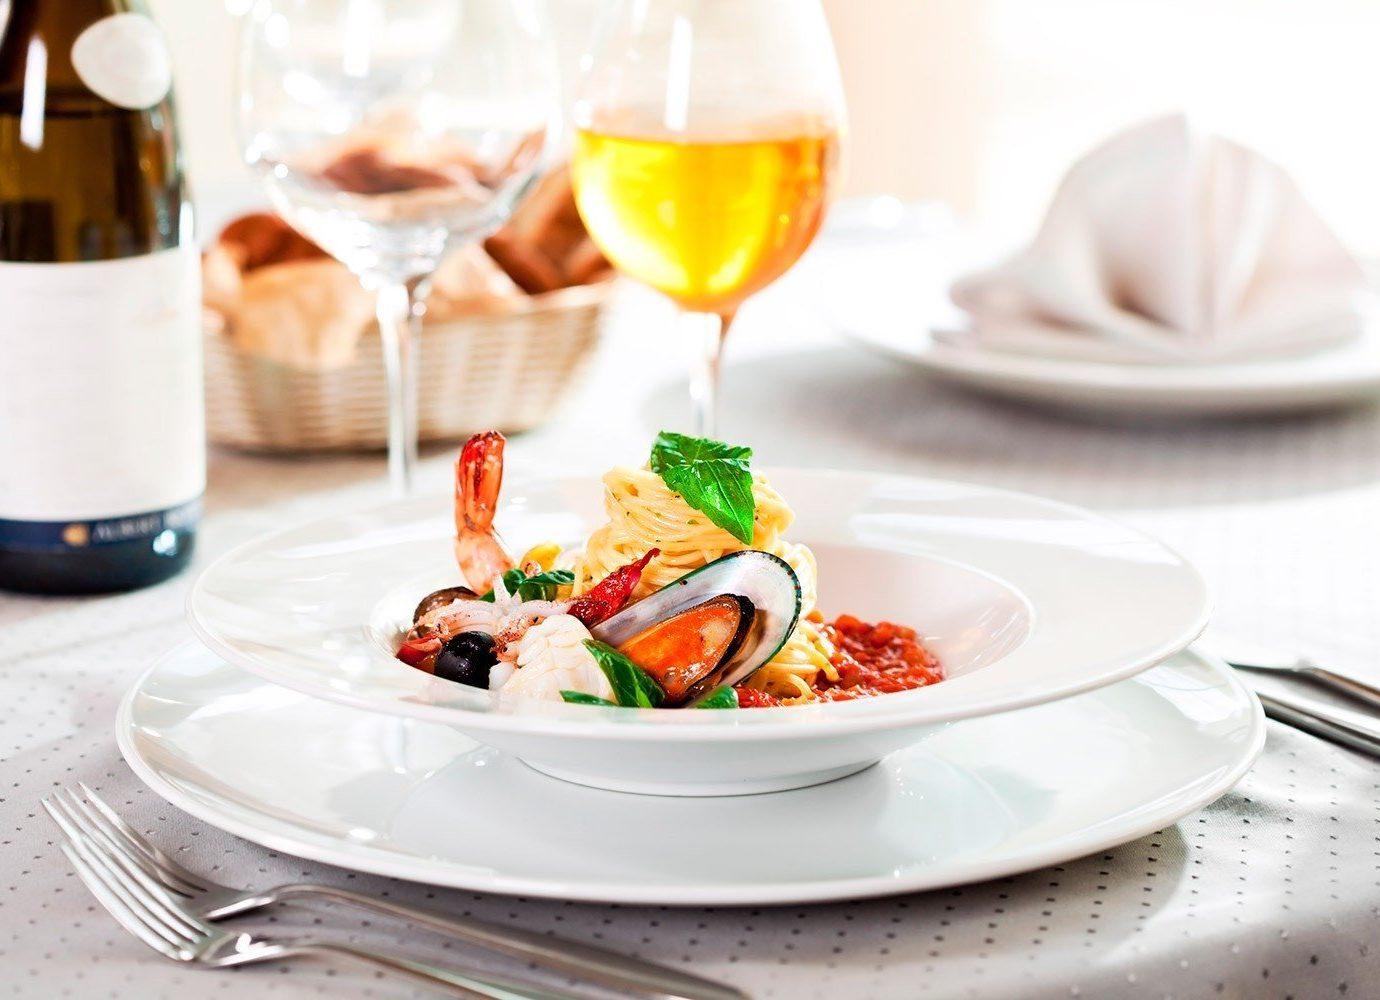 Travel Tips plate table dish food meal breakfast produce brunch cuisine sense restaurant